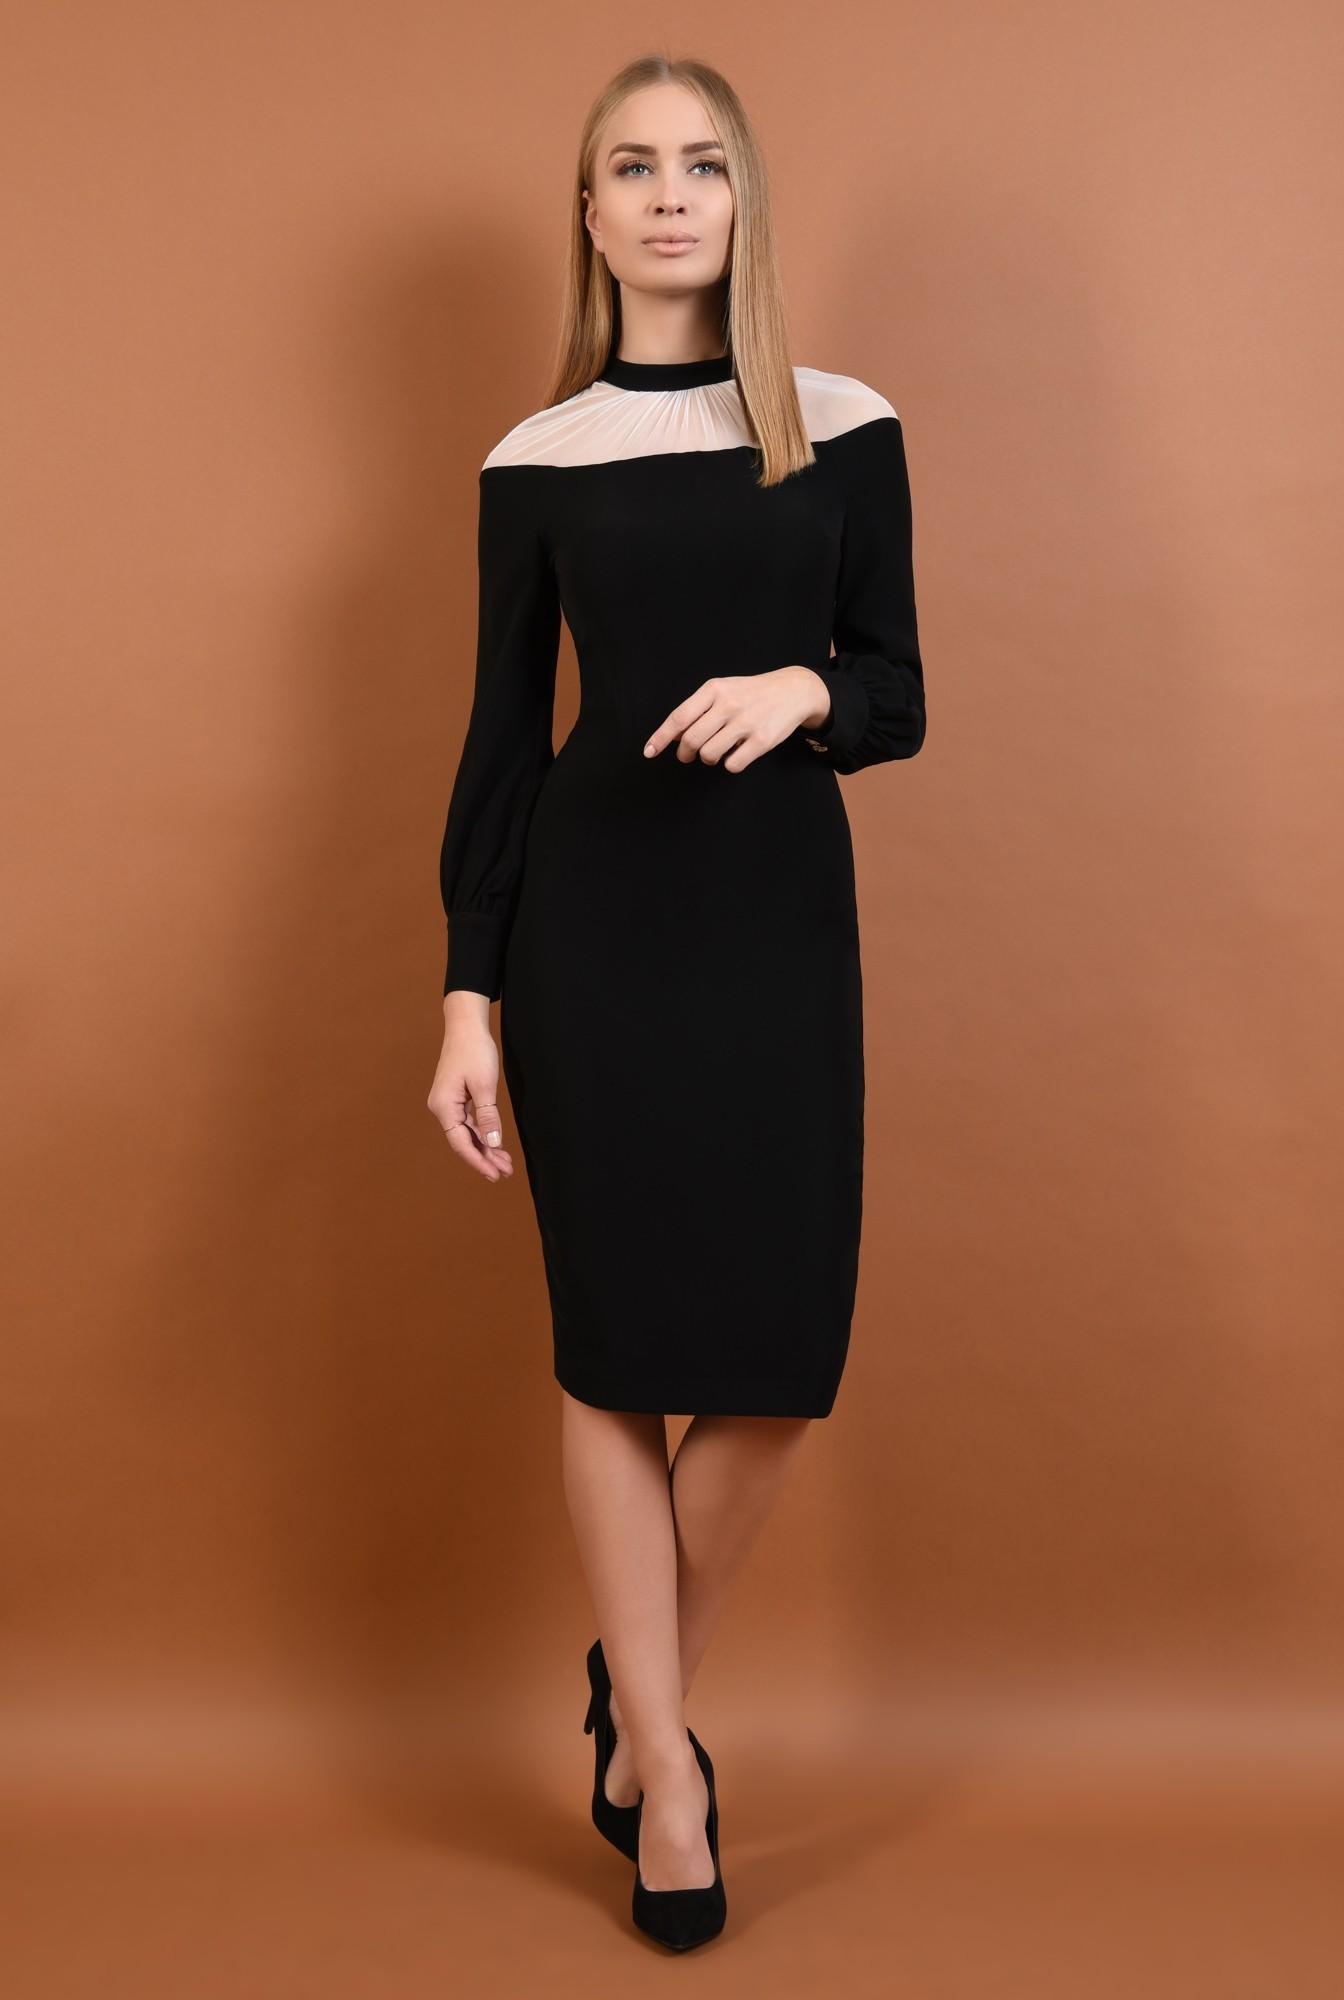 3 - 360 - rochie eleganta, midi, conica, neagra, insertie tul, nasturi metalici